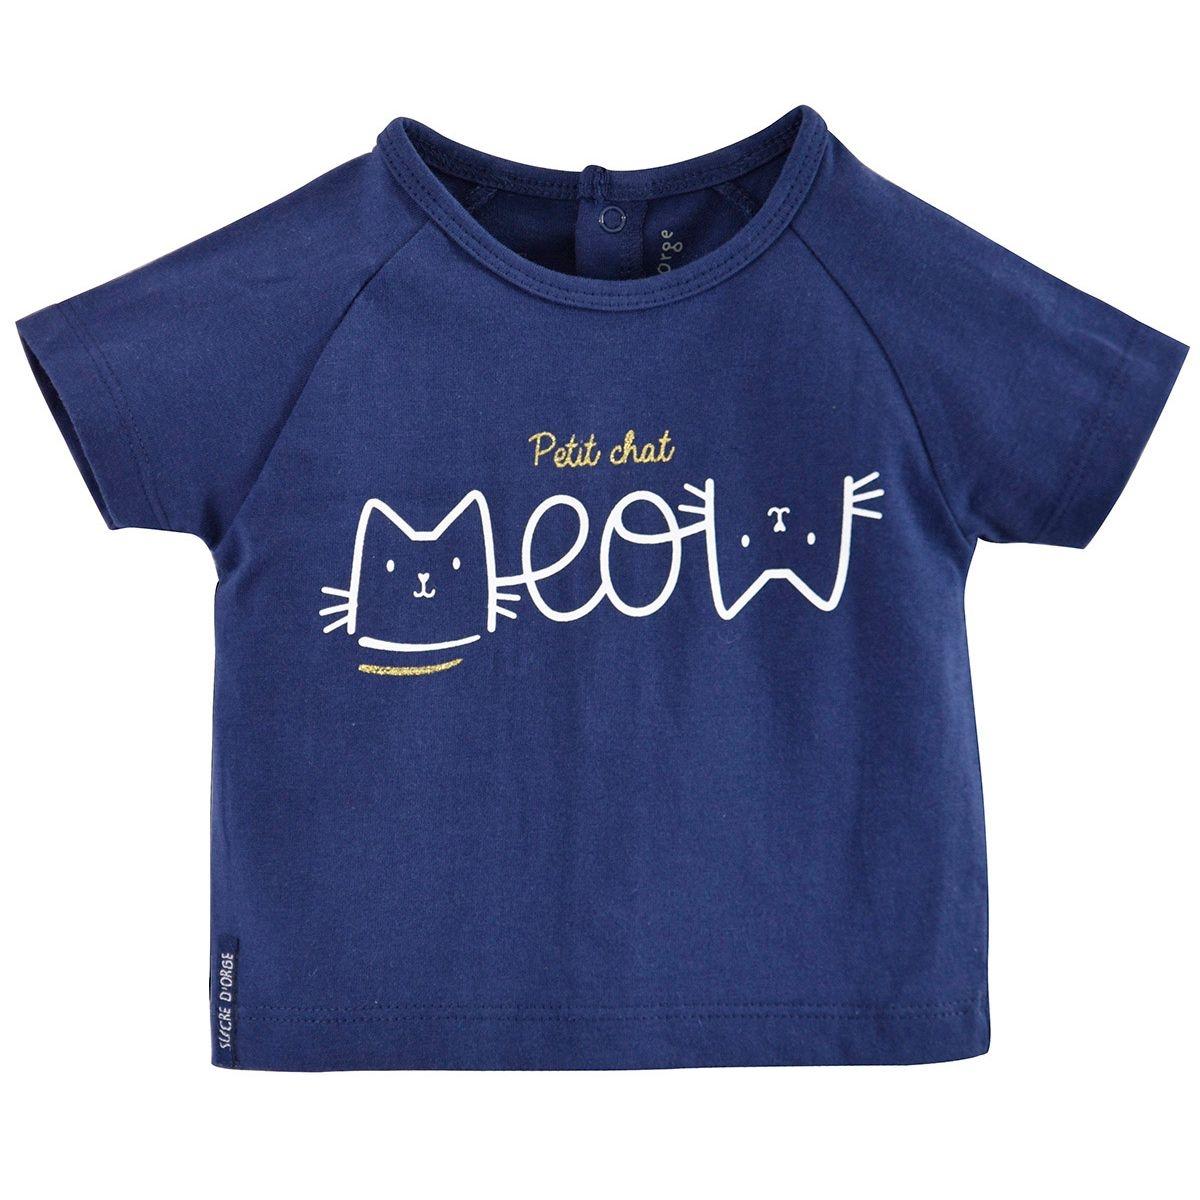 T-shirt marine 3 mois-24 mois